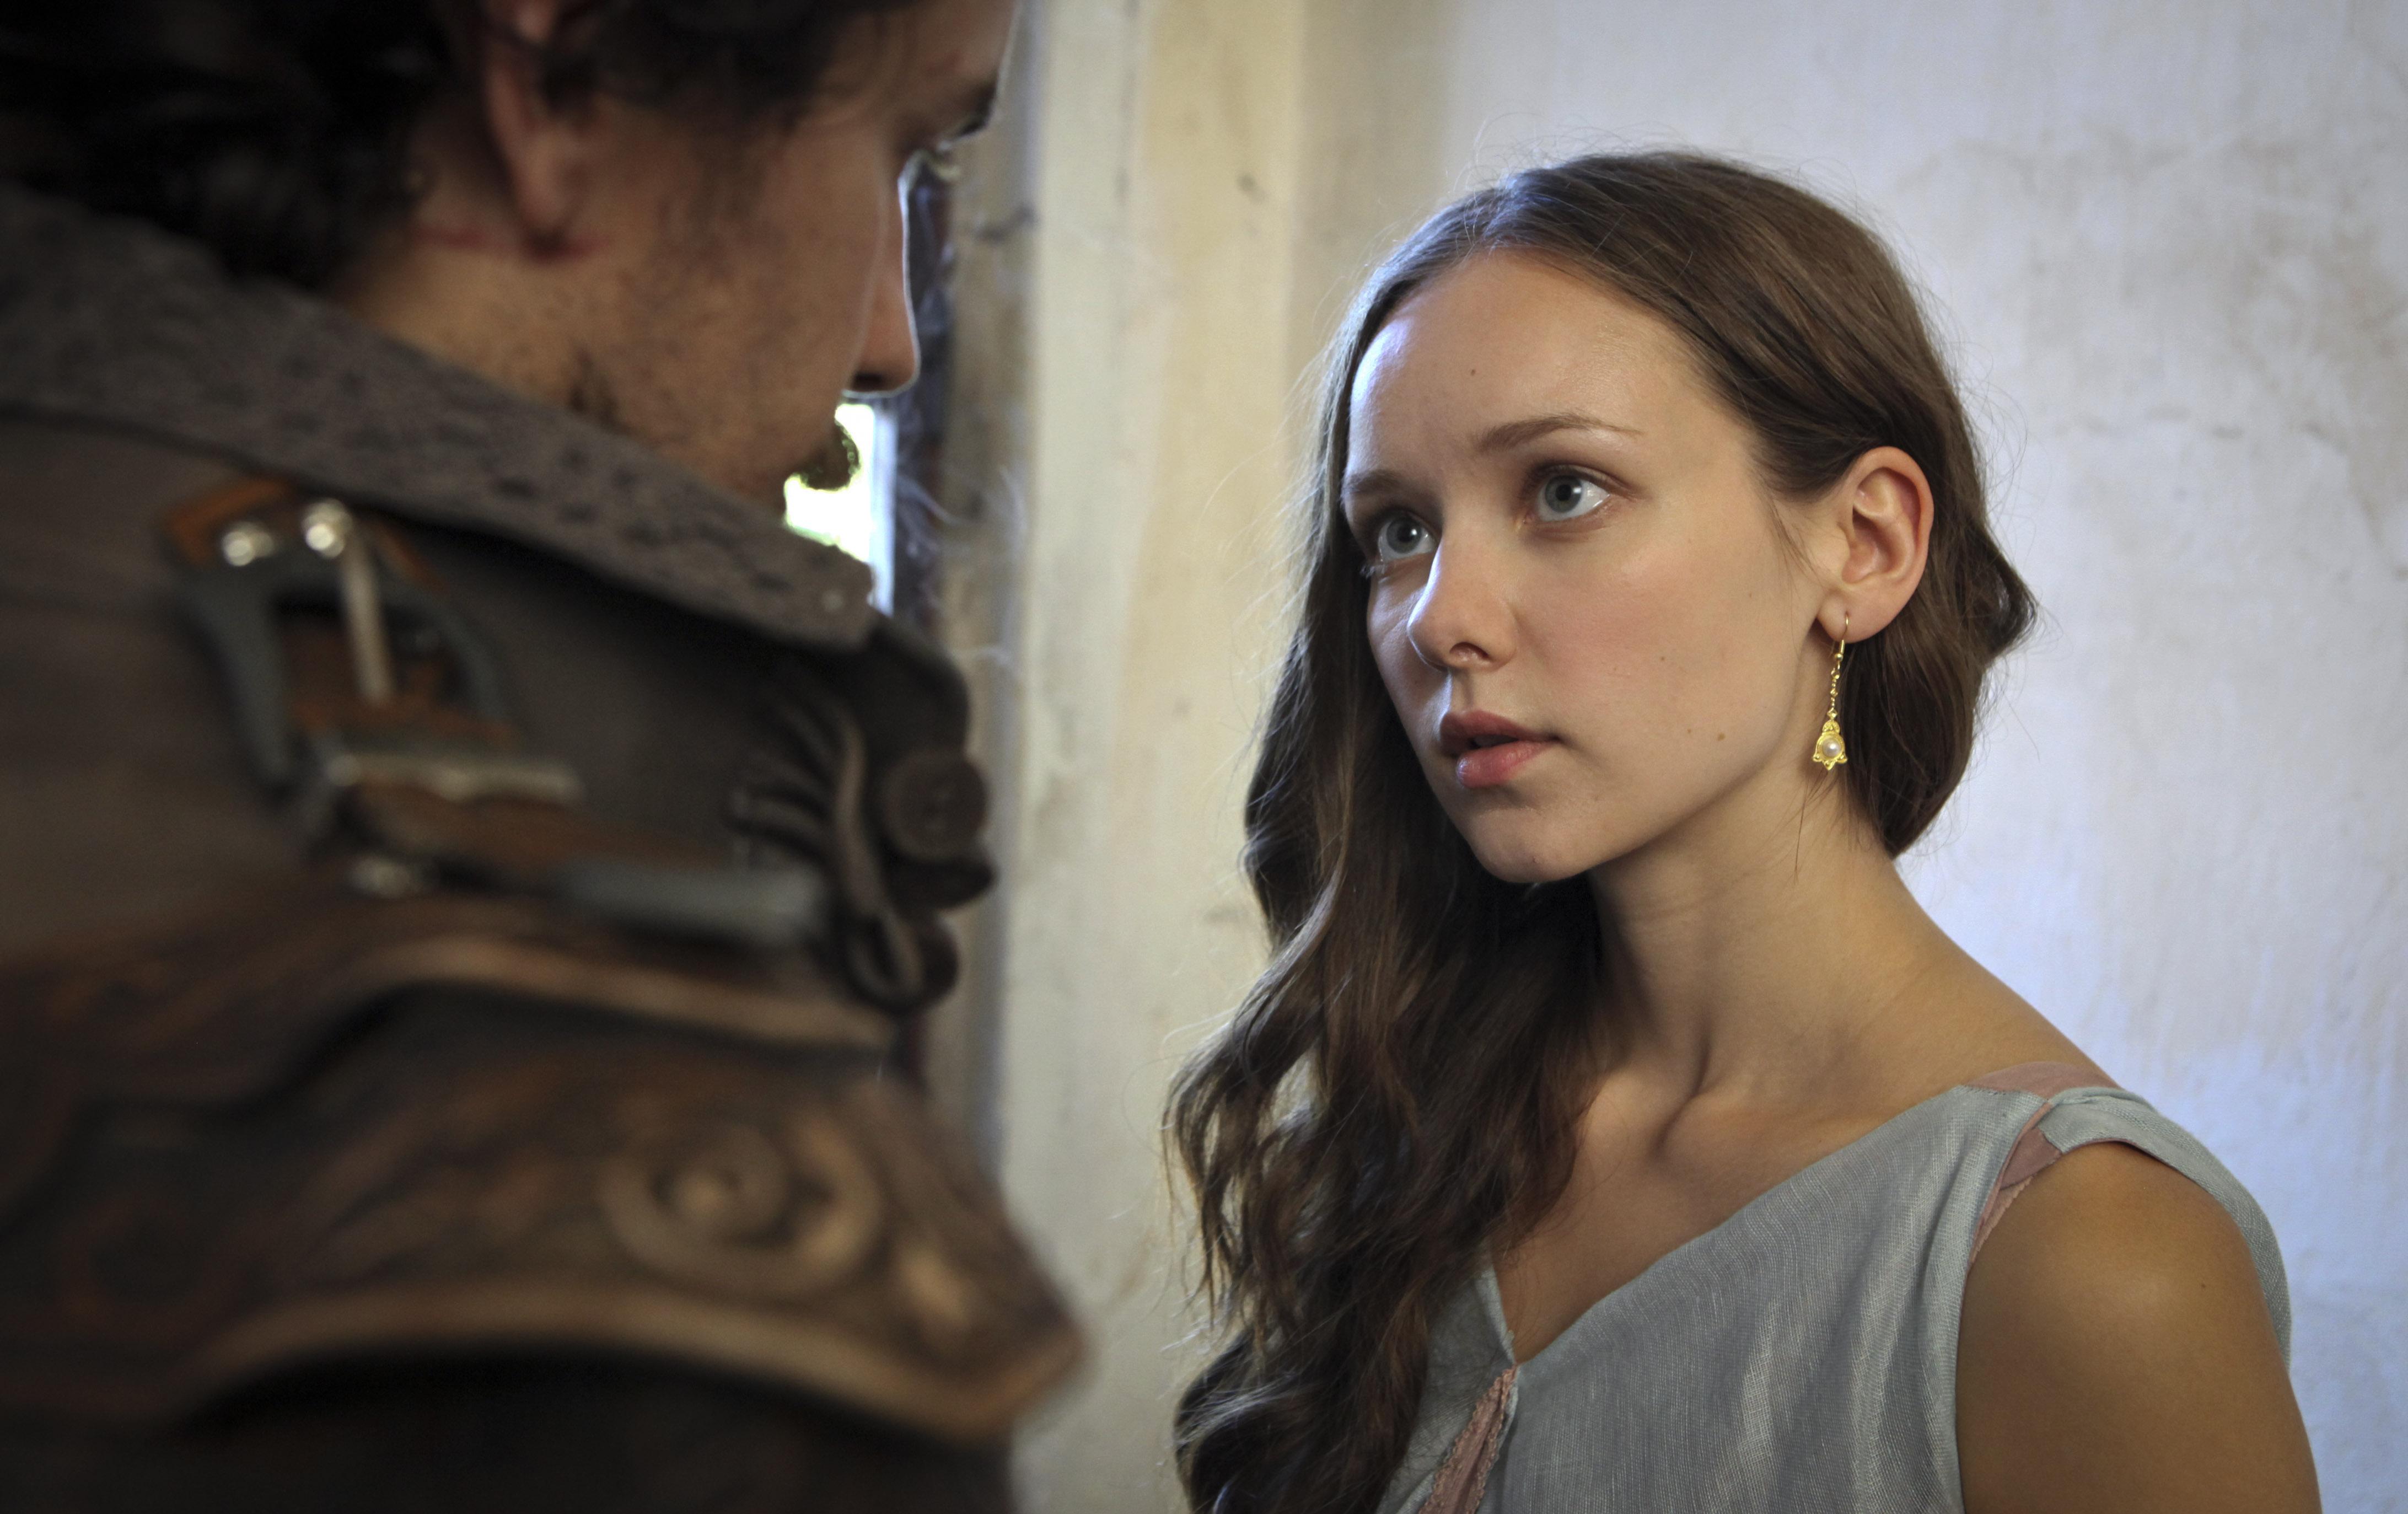 vechernih-platyah-musketir-interteyment-aktrisi-devushka-goliy